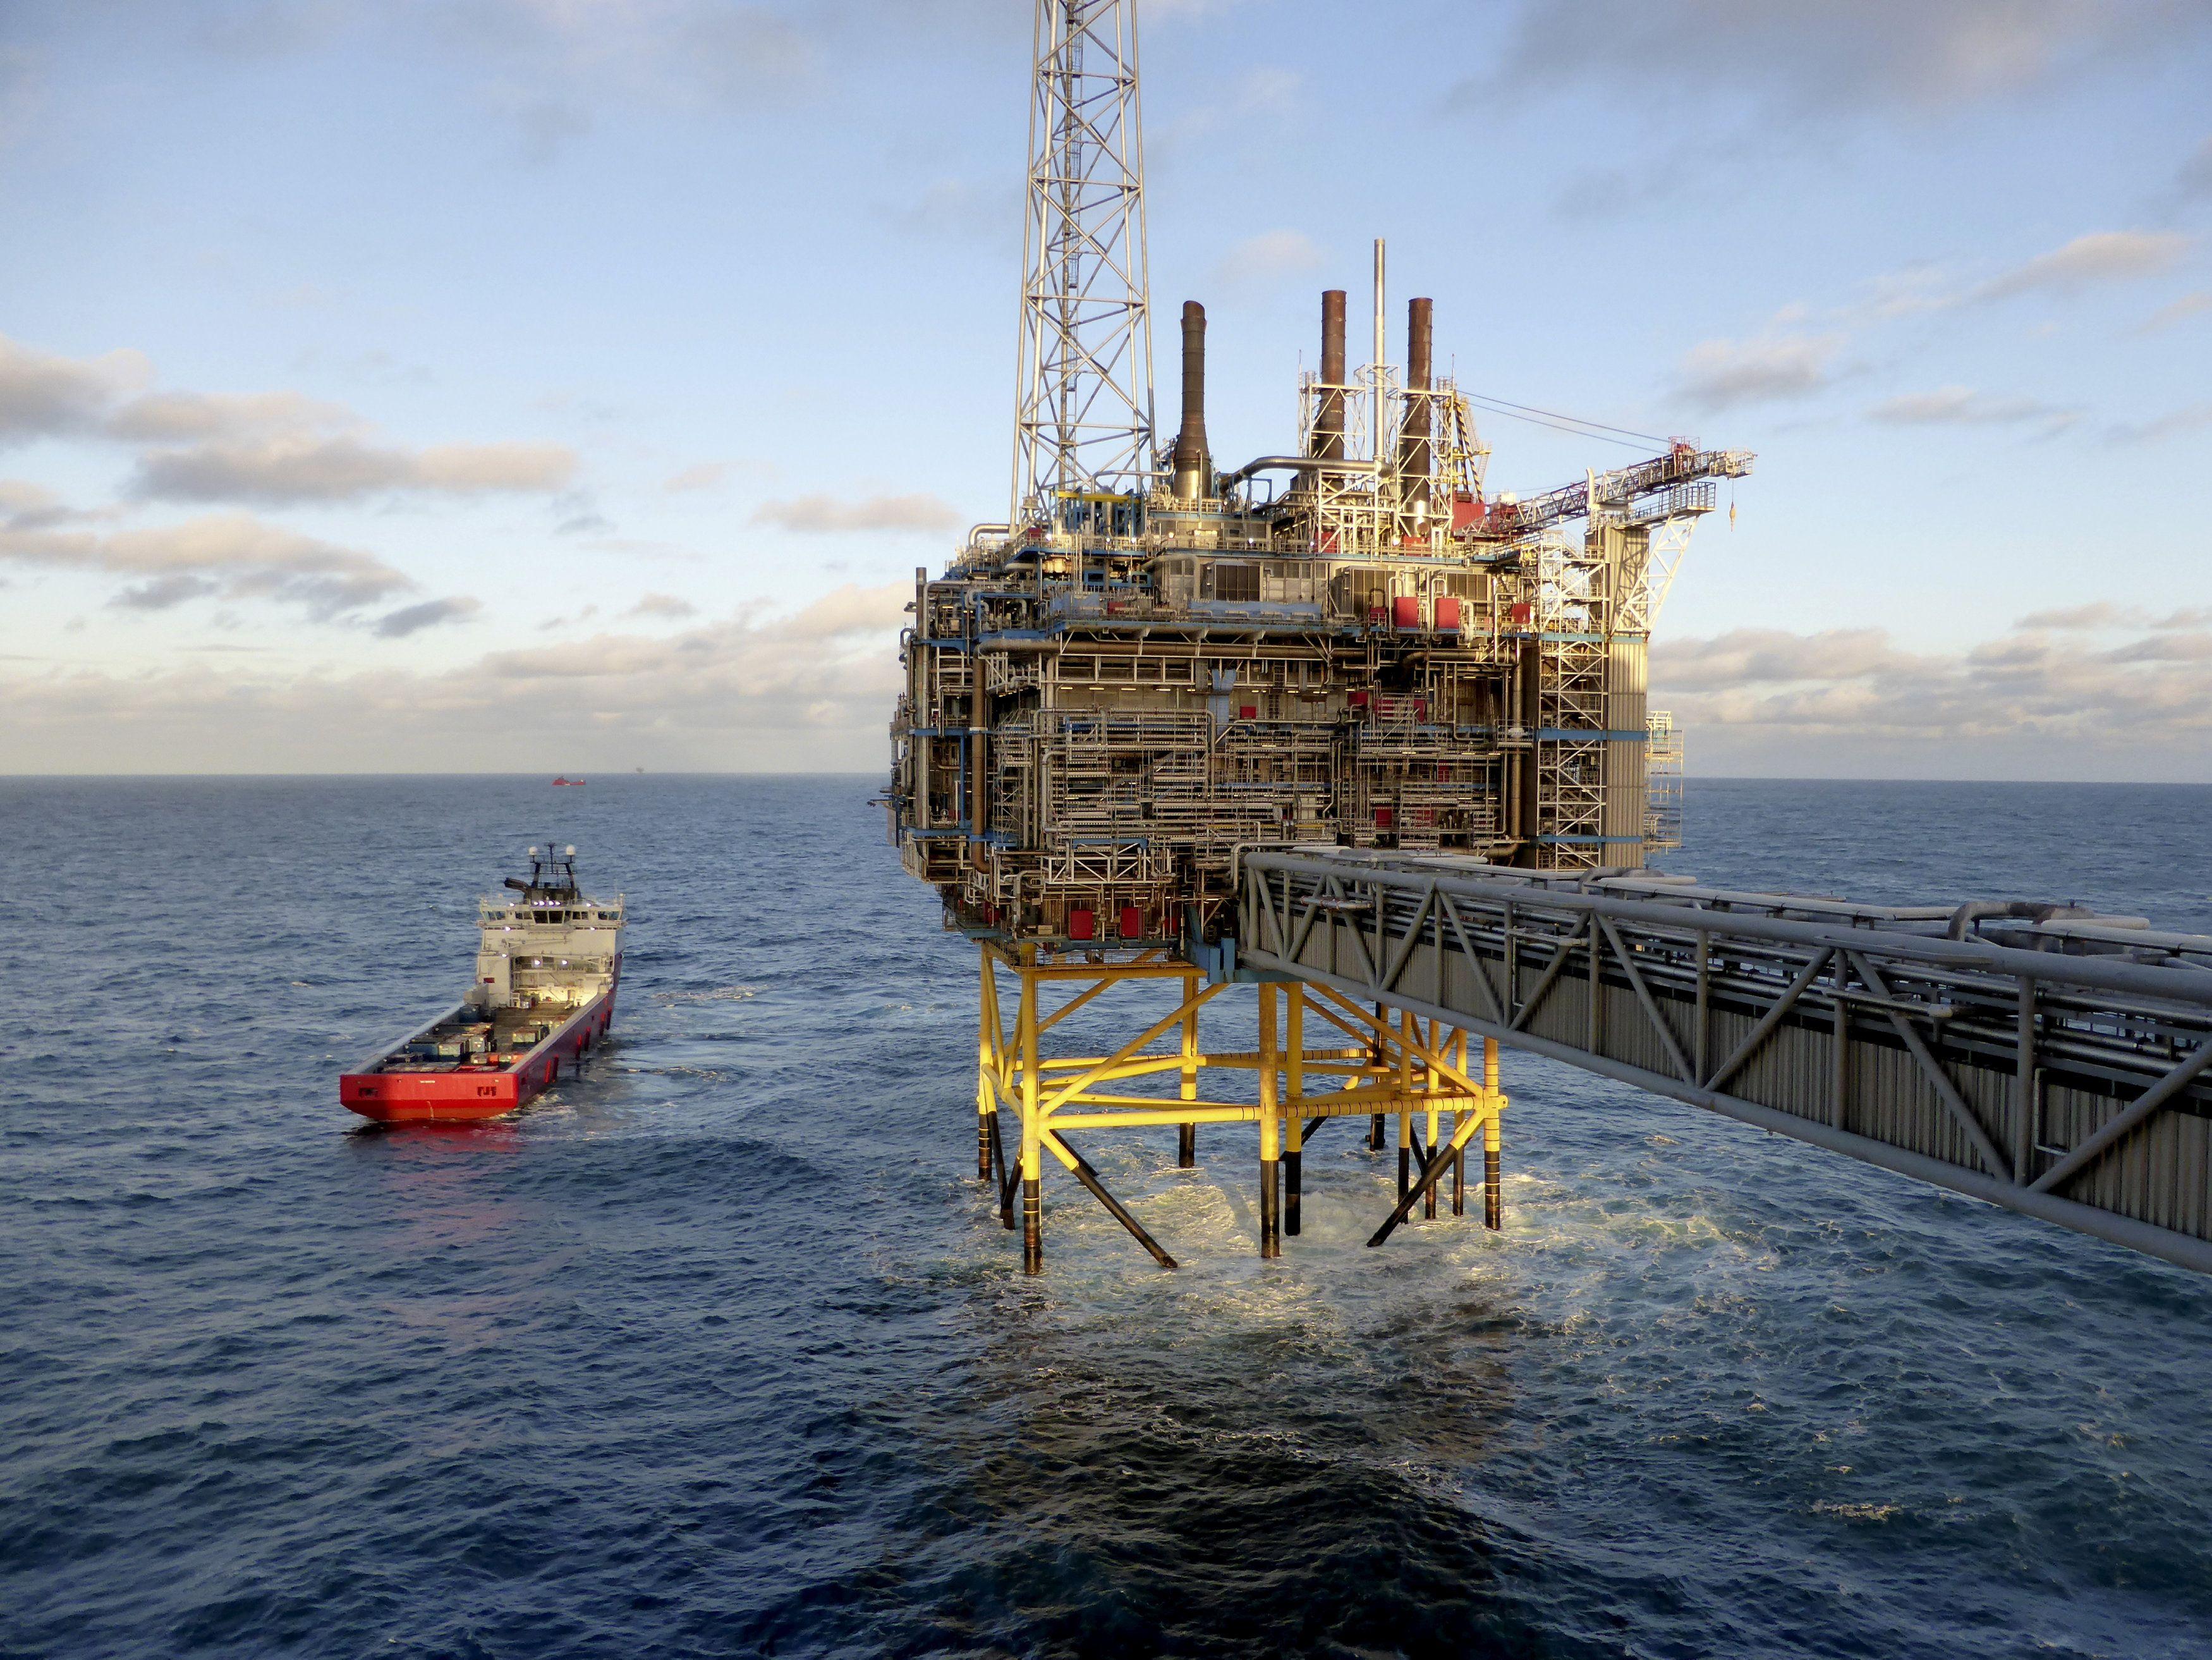 Нефтяная платформа, иллюстрация